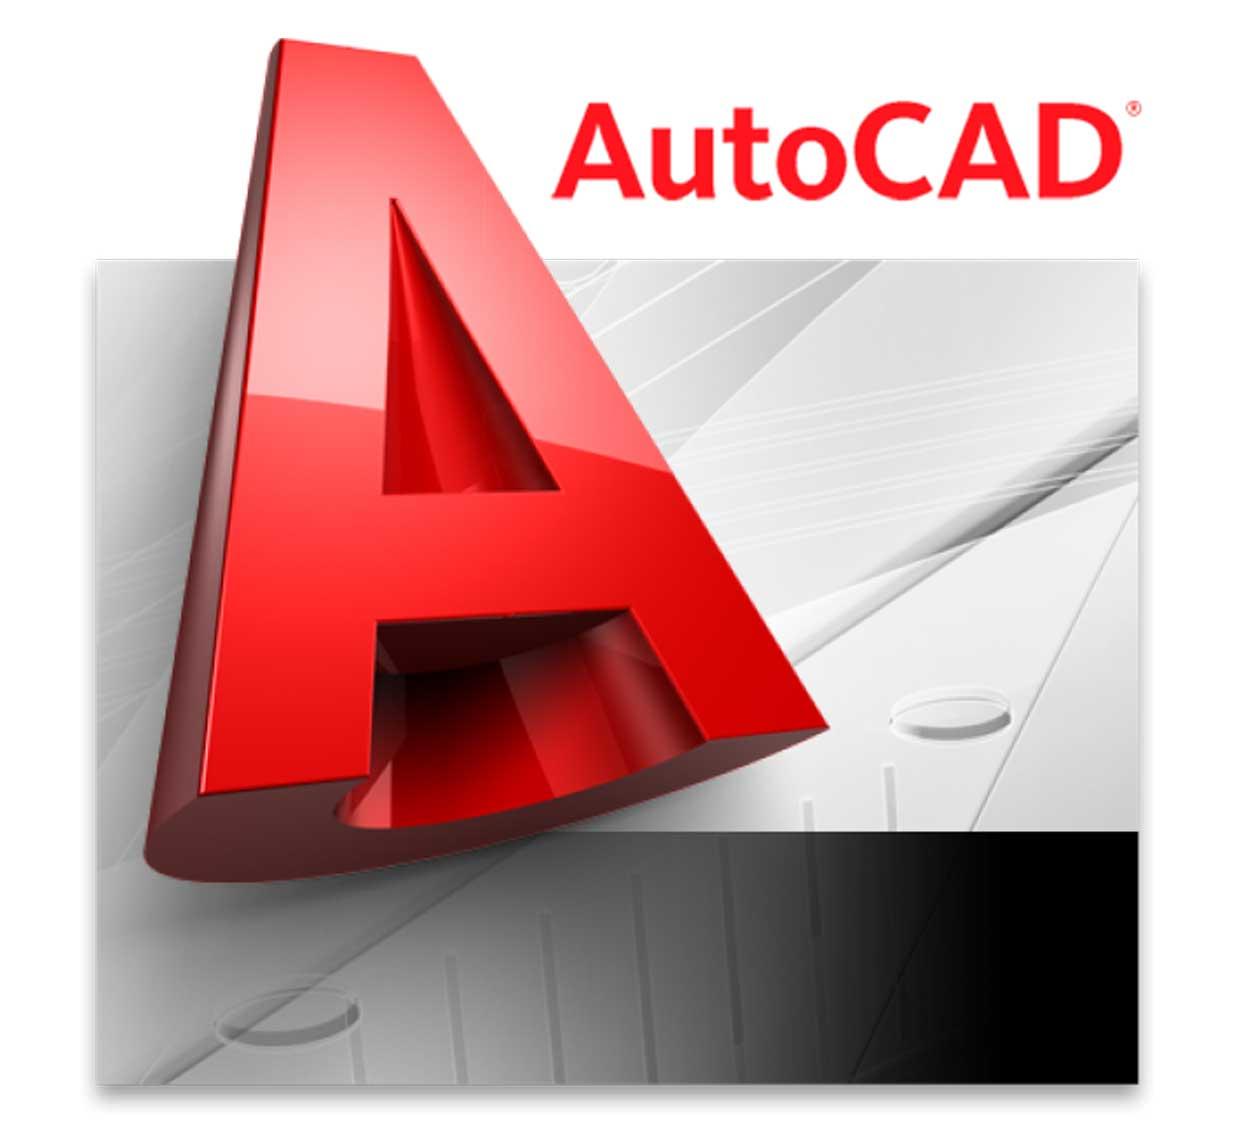 1522325814-autocad-logo.jpg